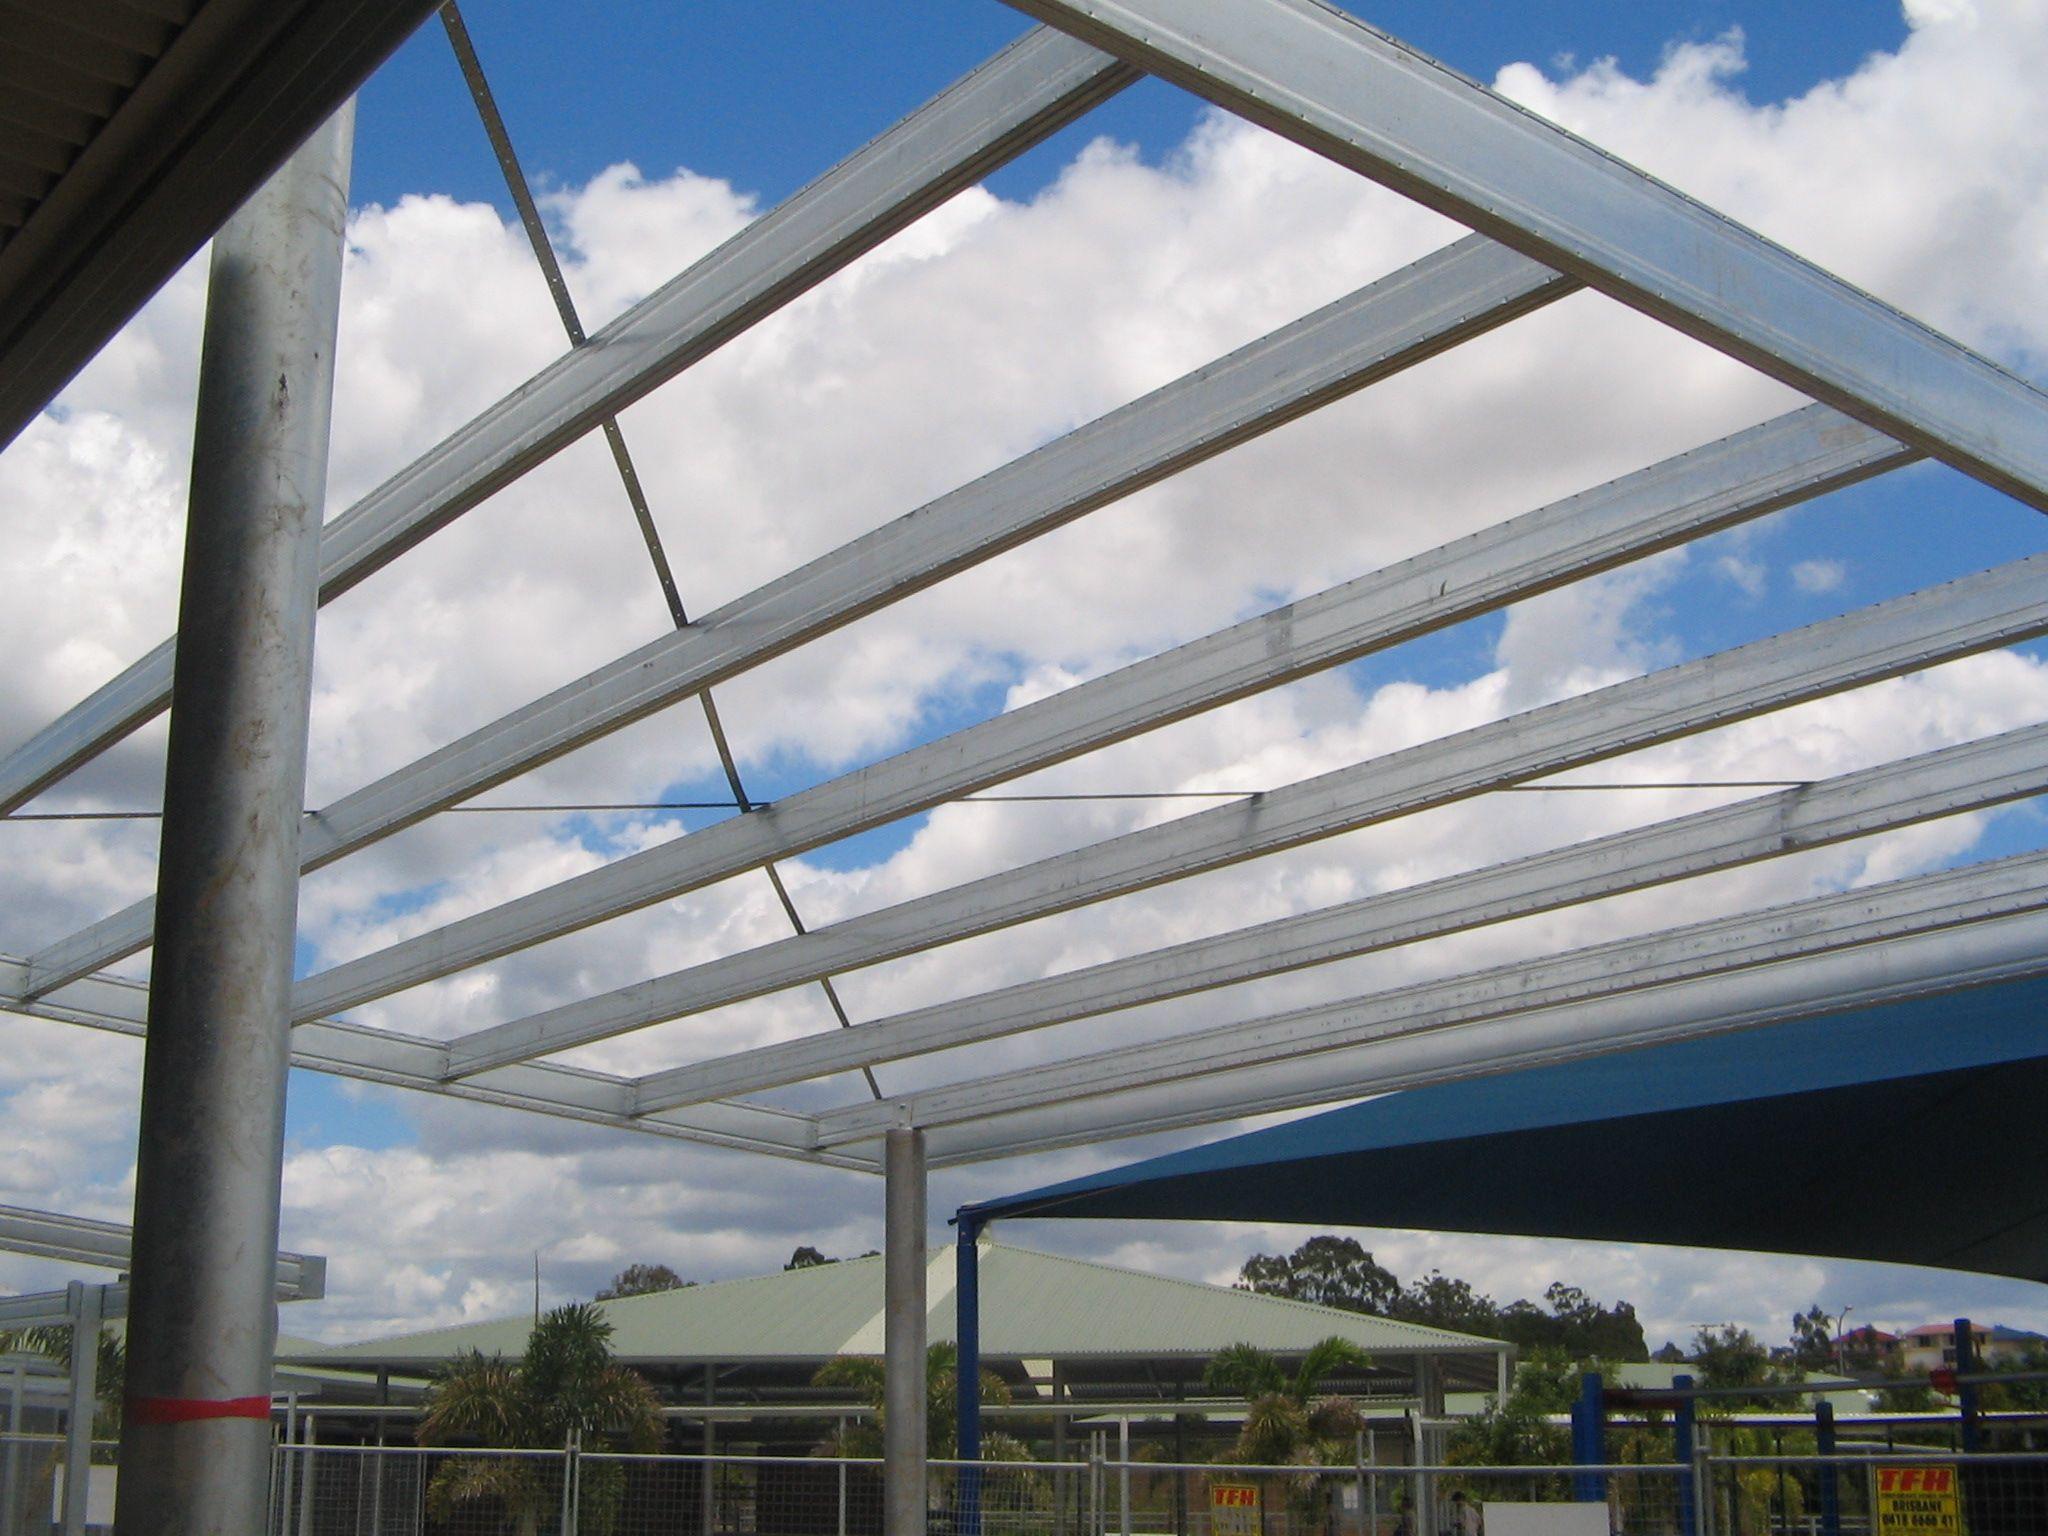 Skillion Roof Using Boxspan Steel Beams Skillion Roof Roof Framing Steel Beams